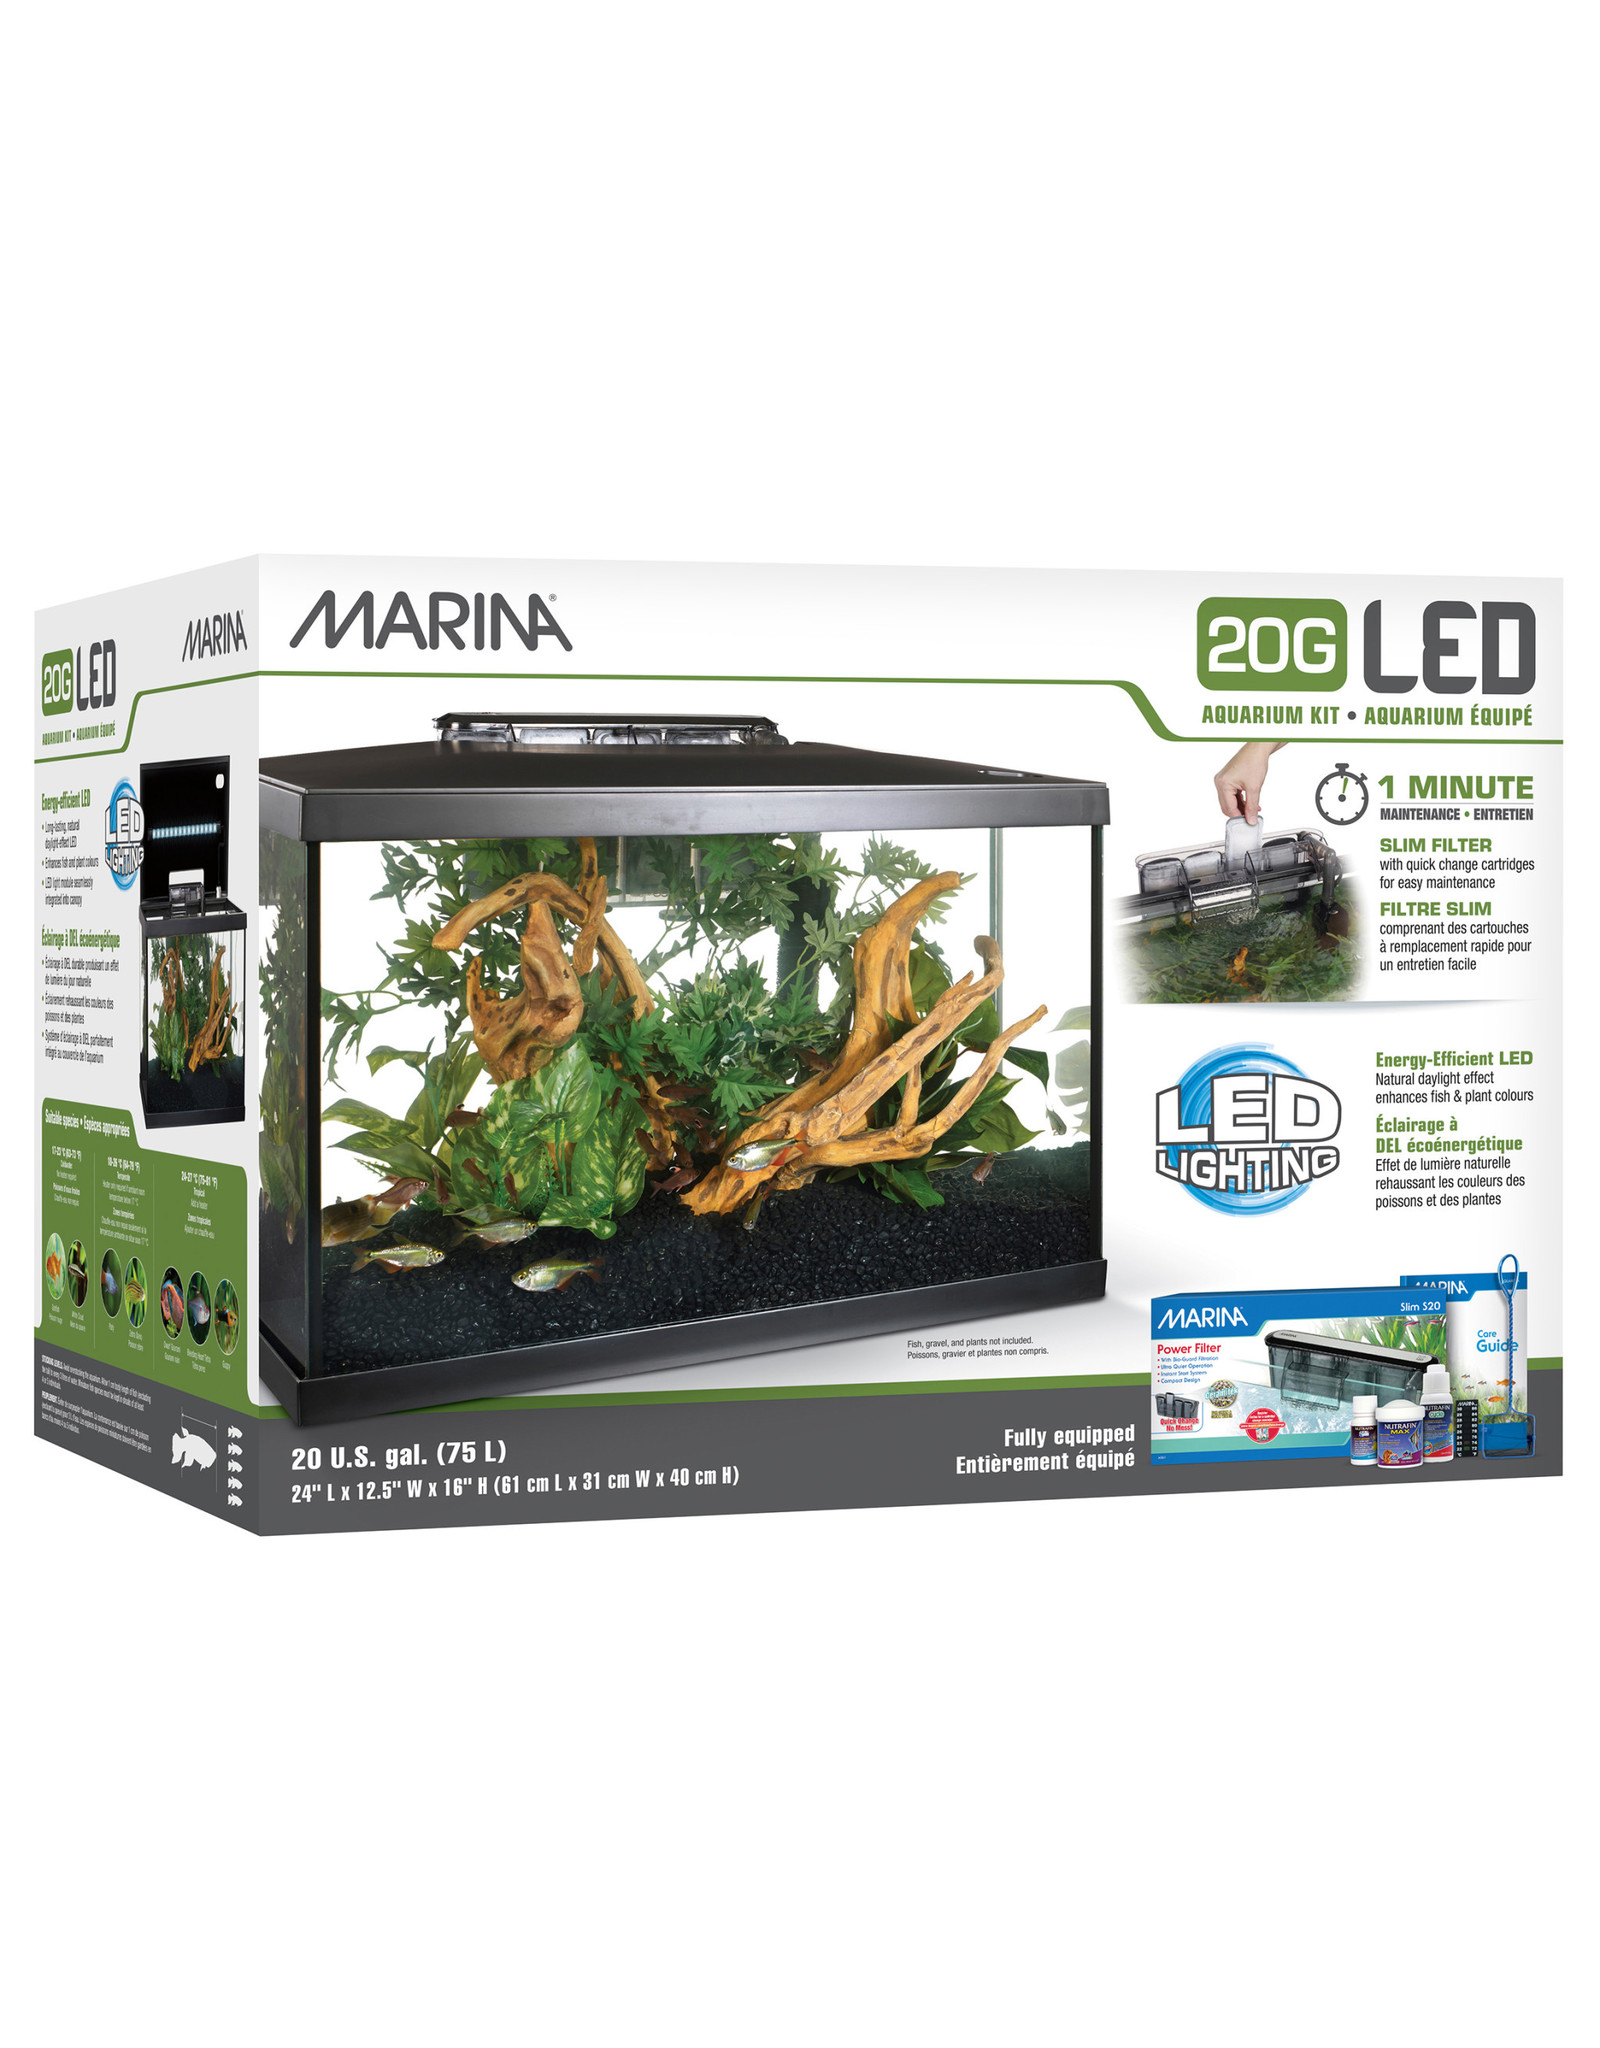 Marina Marina 20G (20 Gal.) LED Aquarium Kit